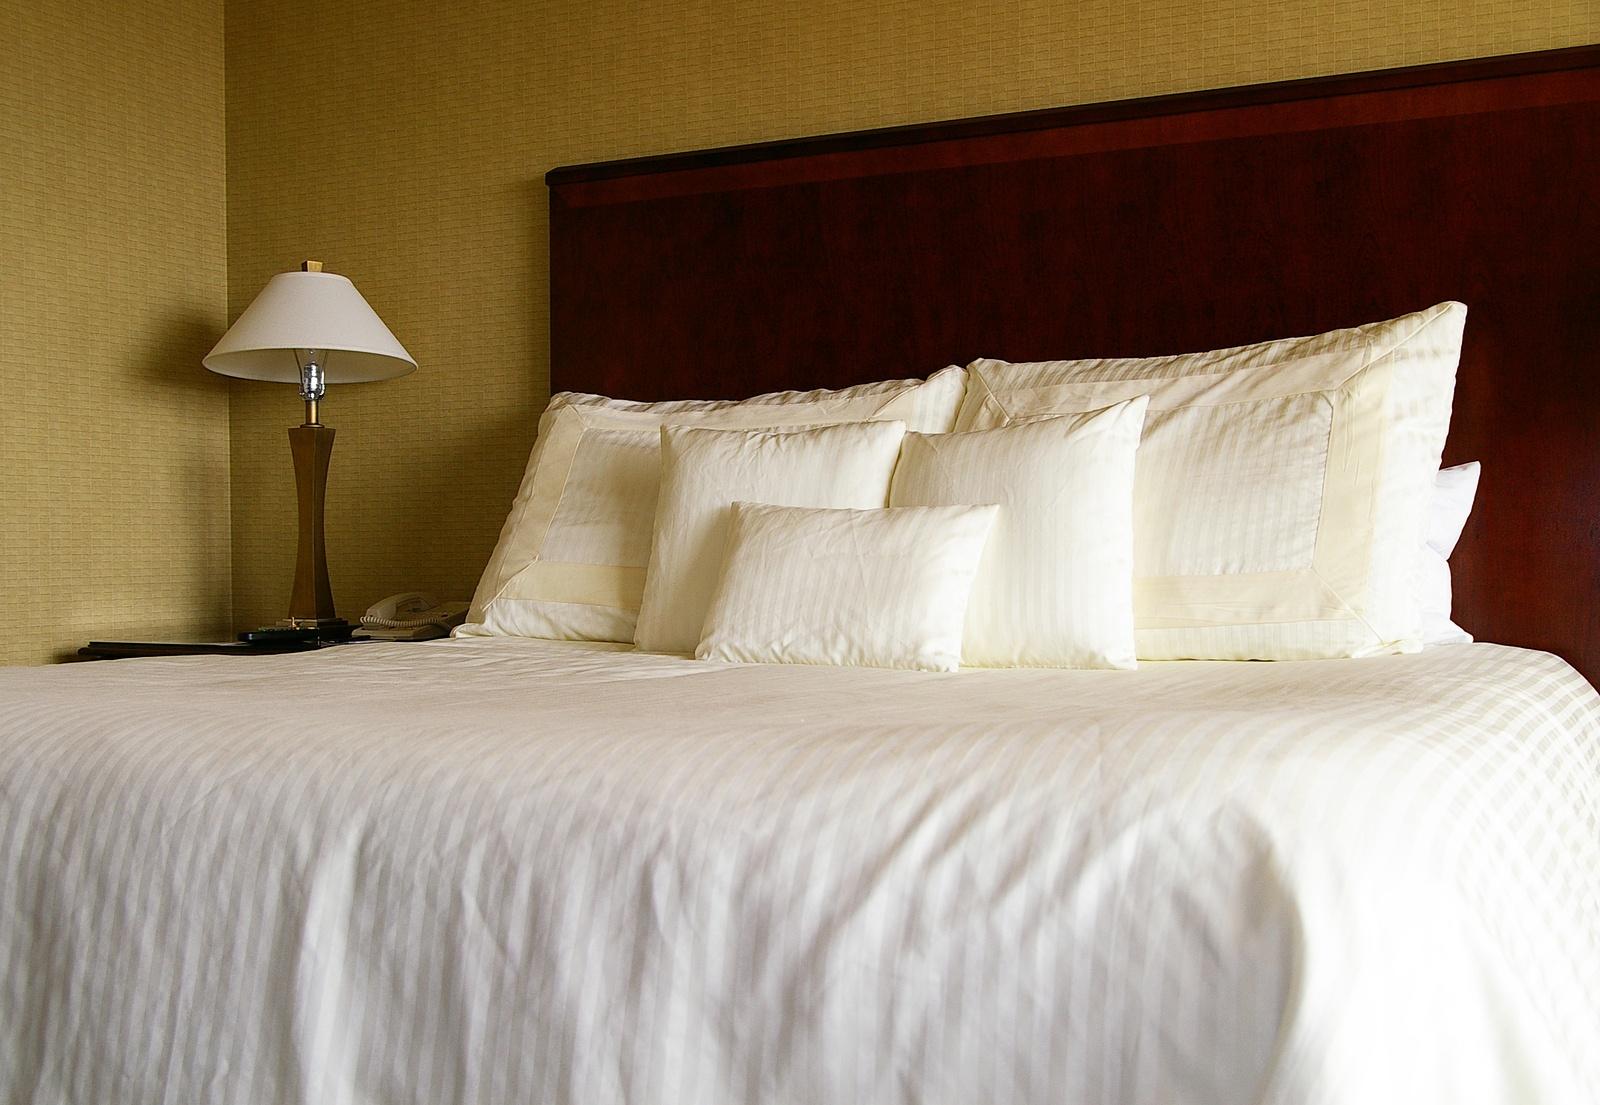 bigstock-Bed-2563872.jpg